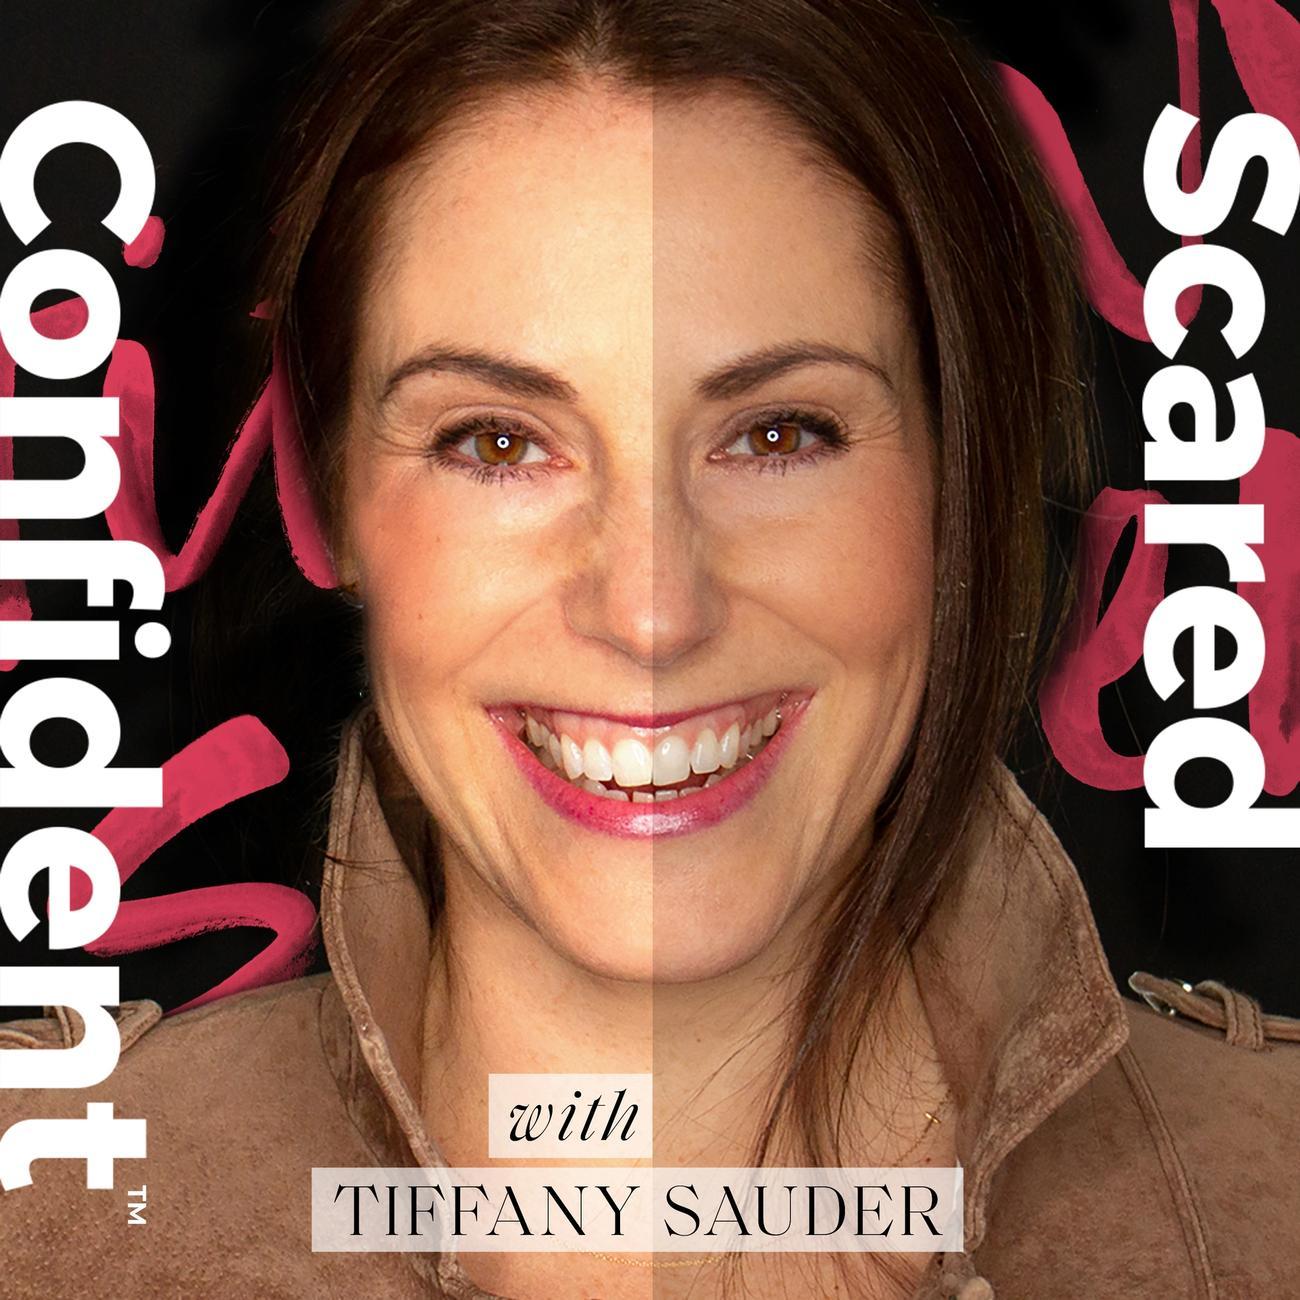 Trailer: I am Scared Confident